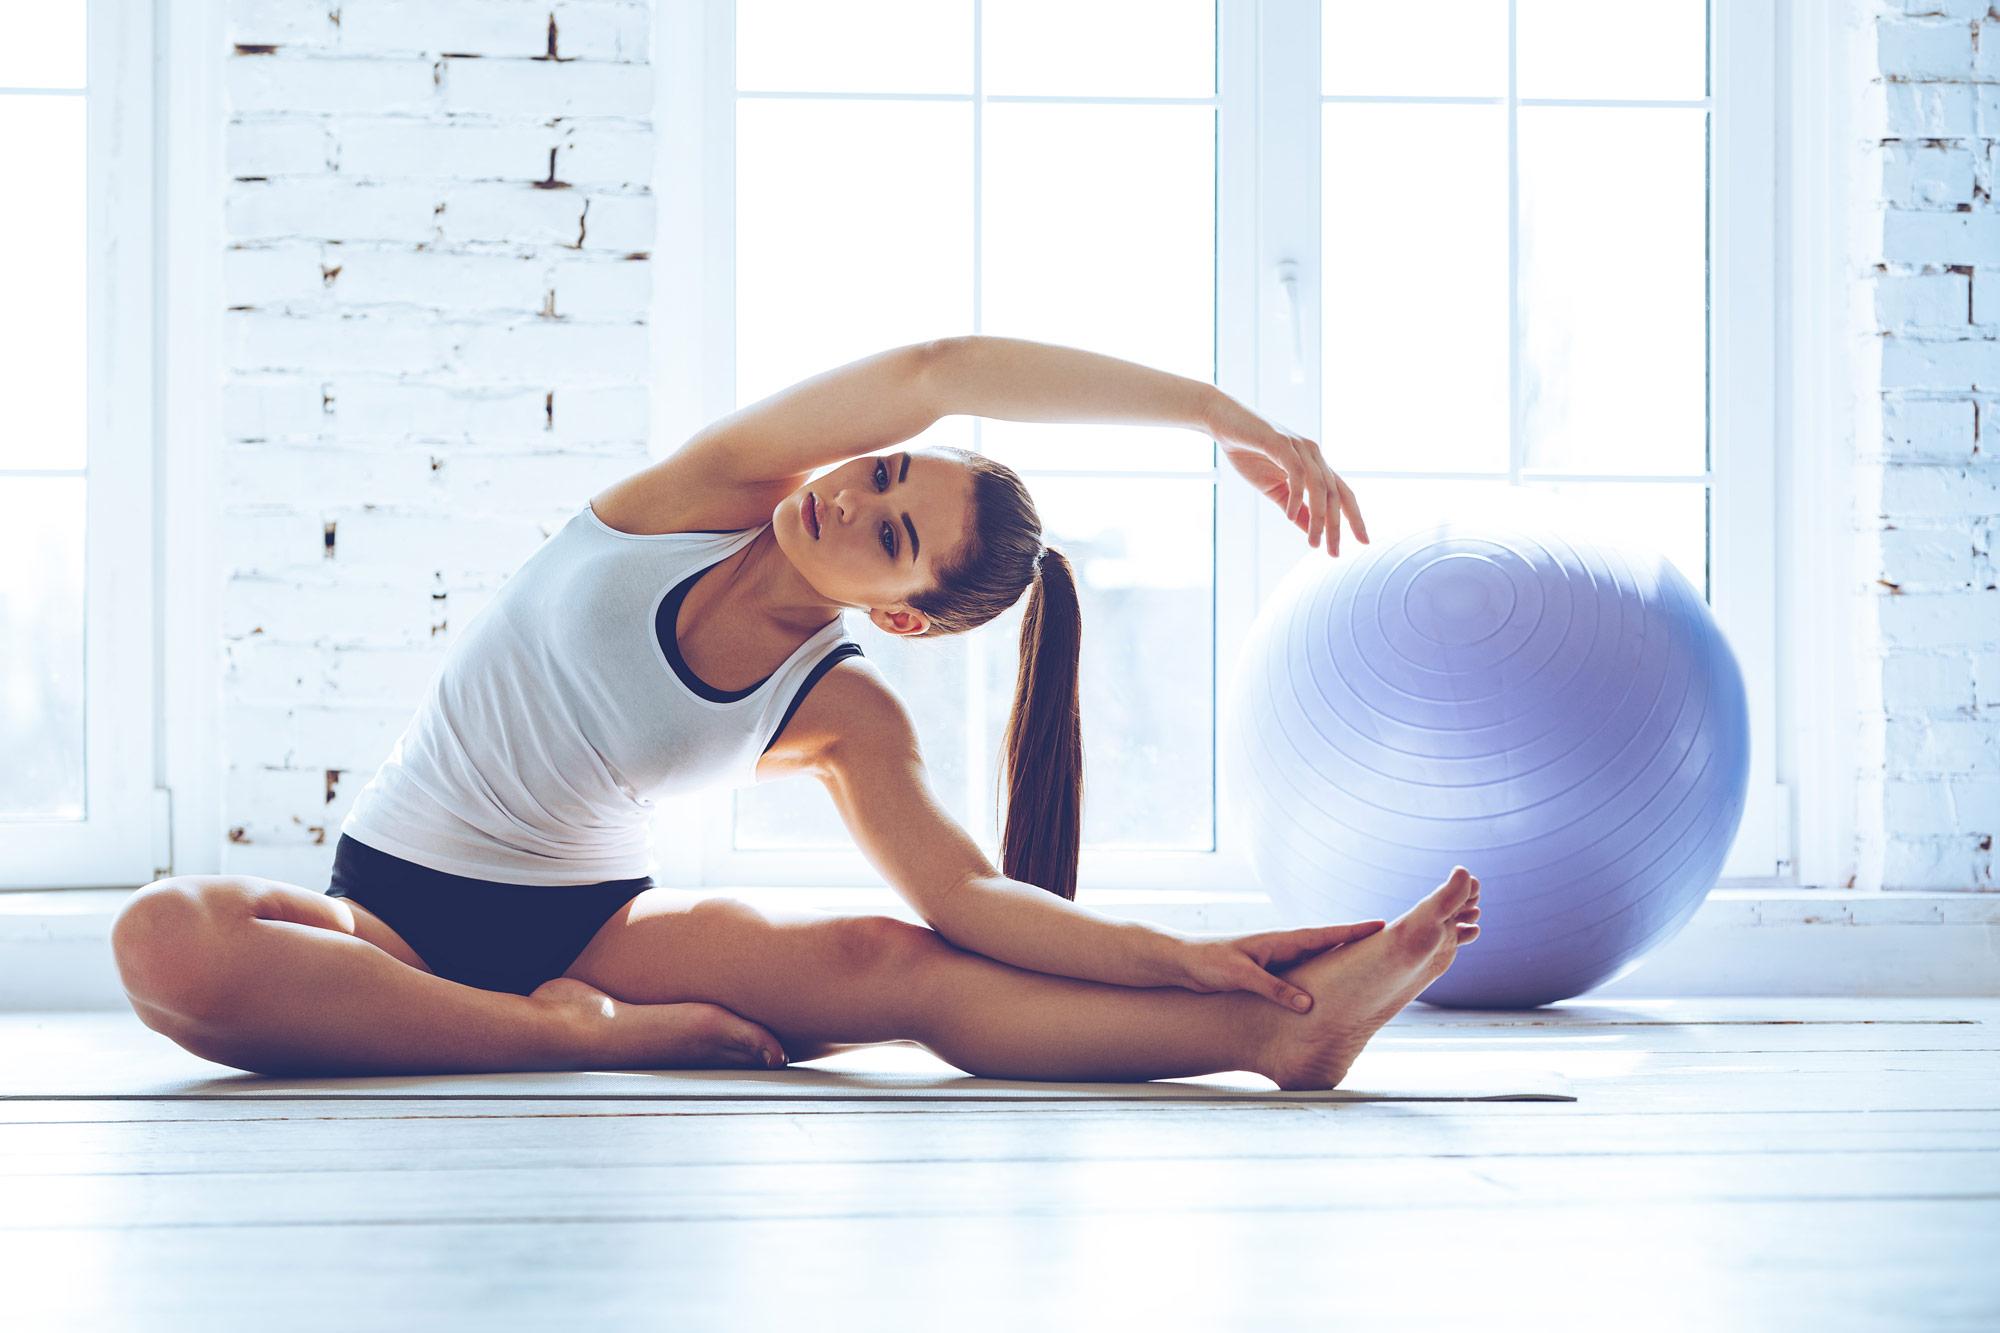 Pilates-Yoga-Website-Industries-107618064